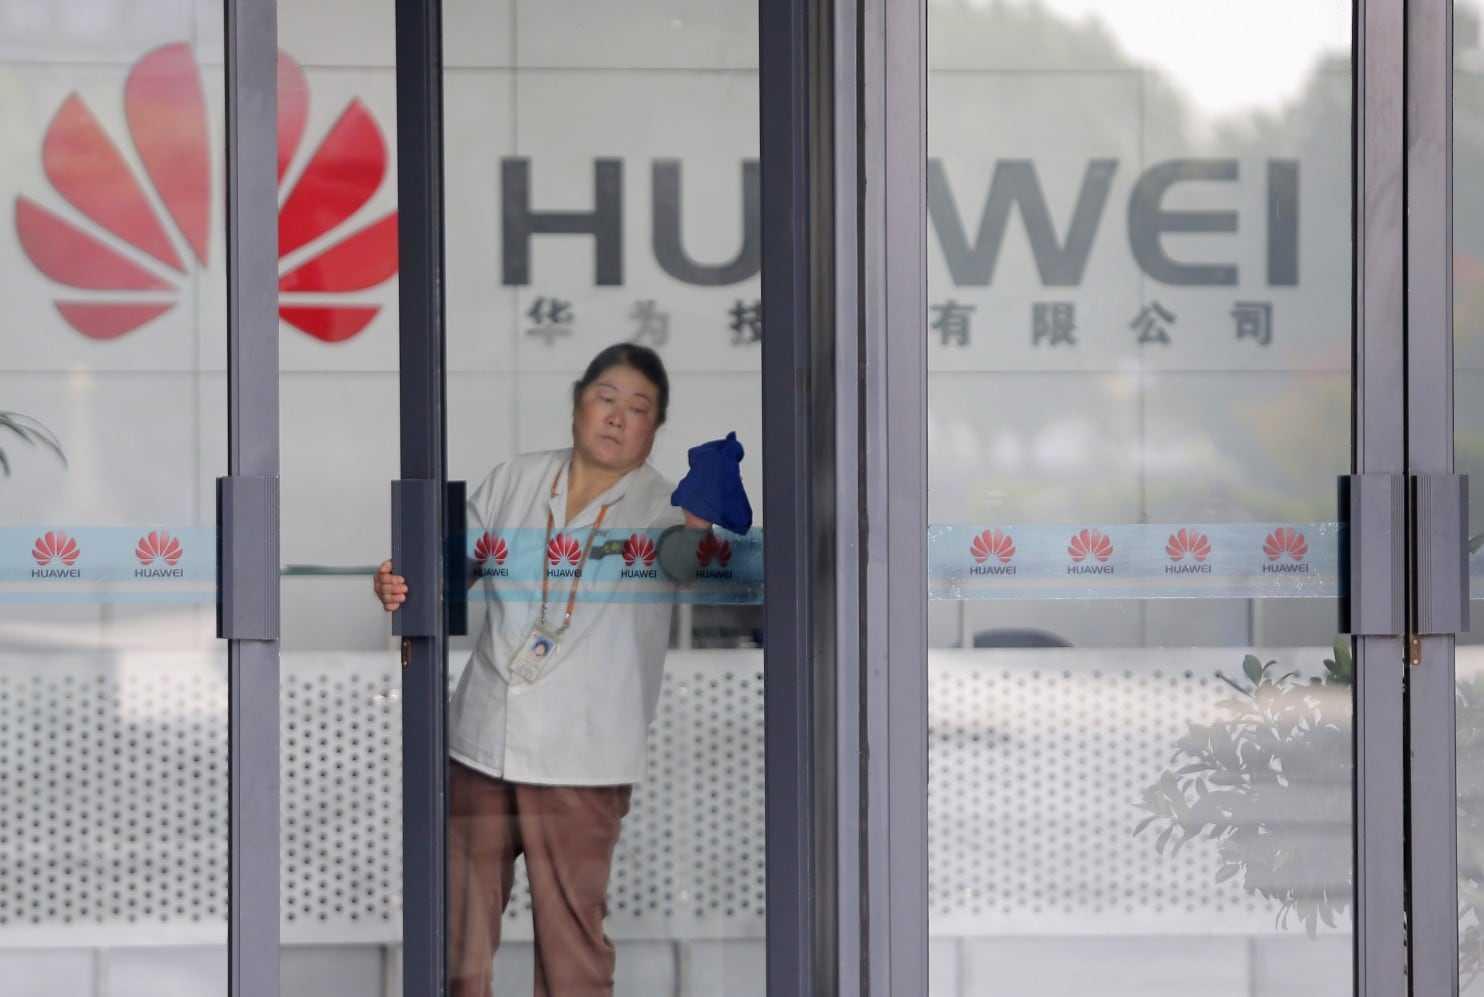 Huawei прекращает производство процессоров kirin из-за санкций сша - androidinsider.ru